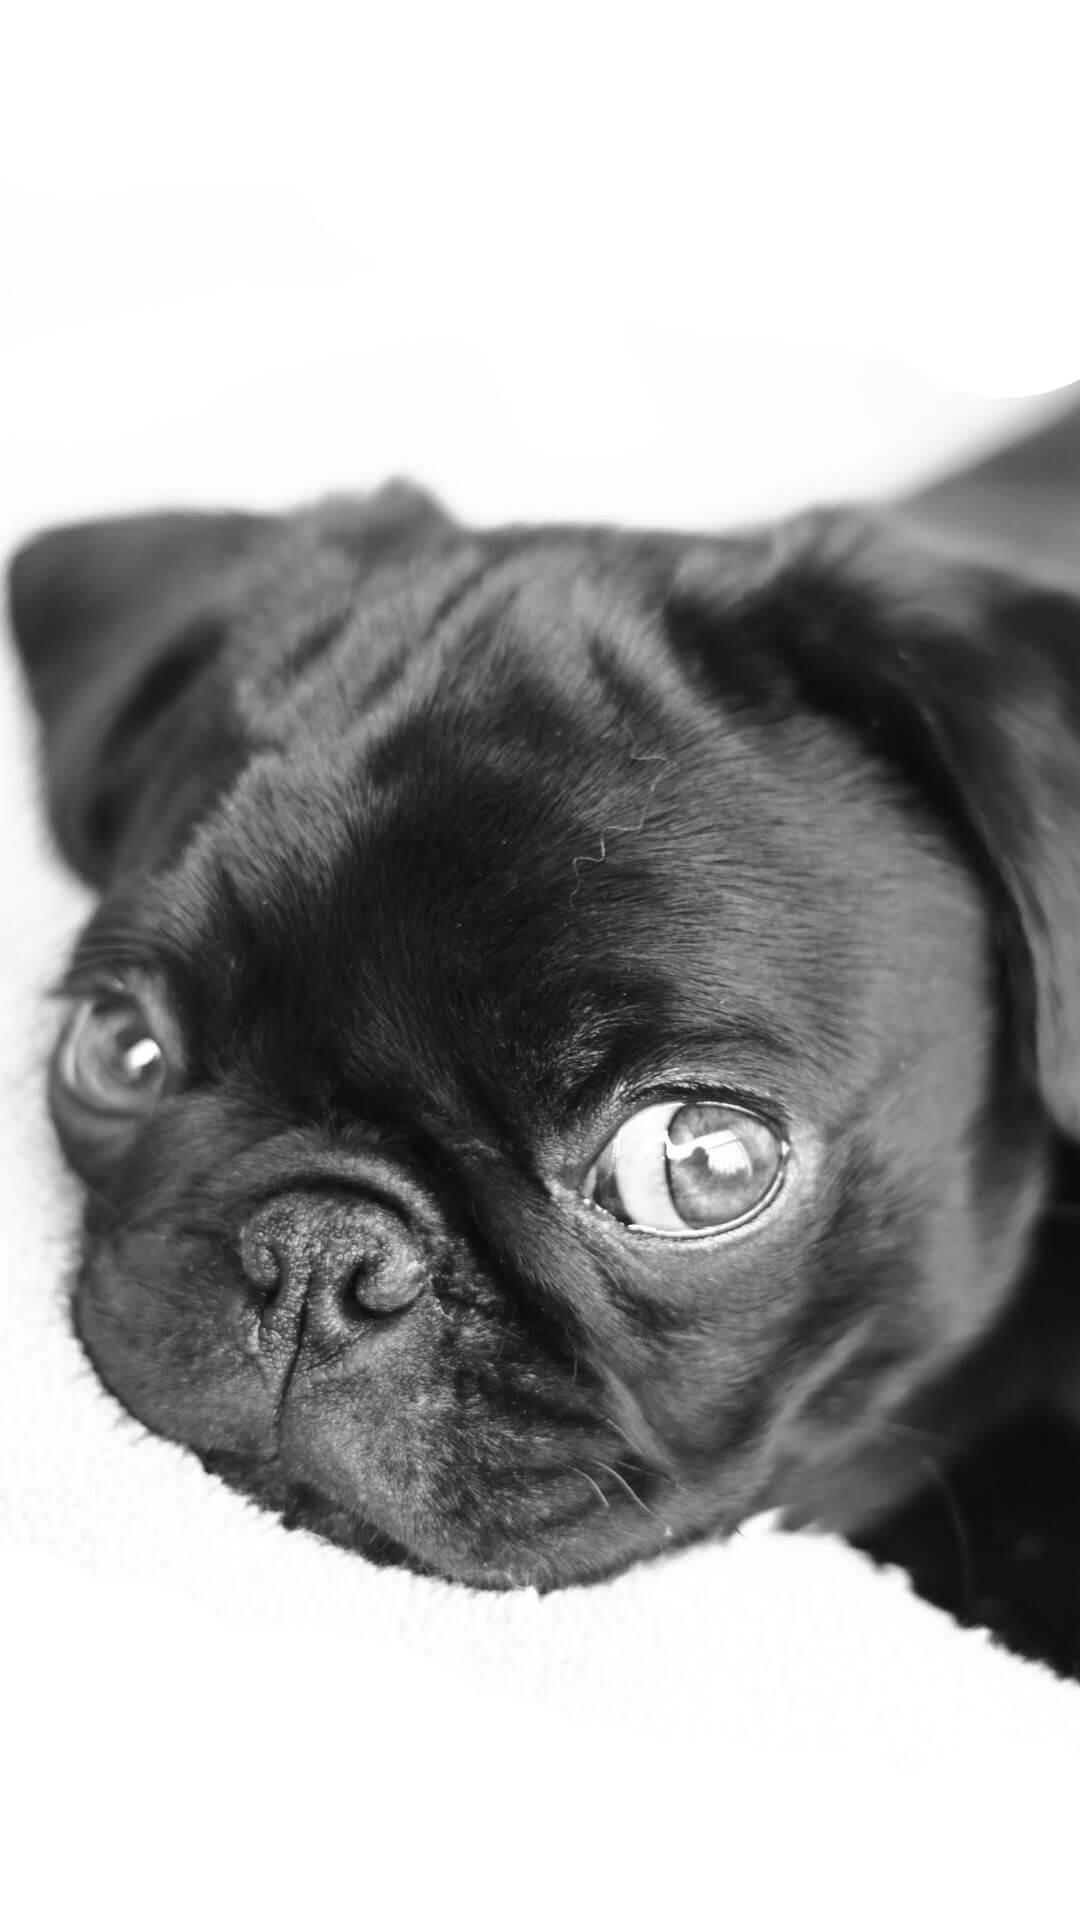 Fall Pug Wallpaper Puppy Wallpaper And Screensavers 53 Images